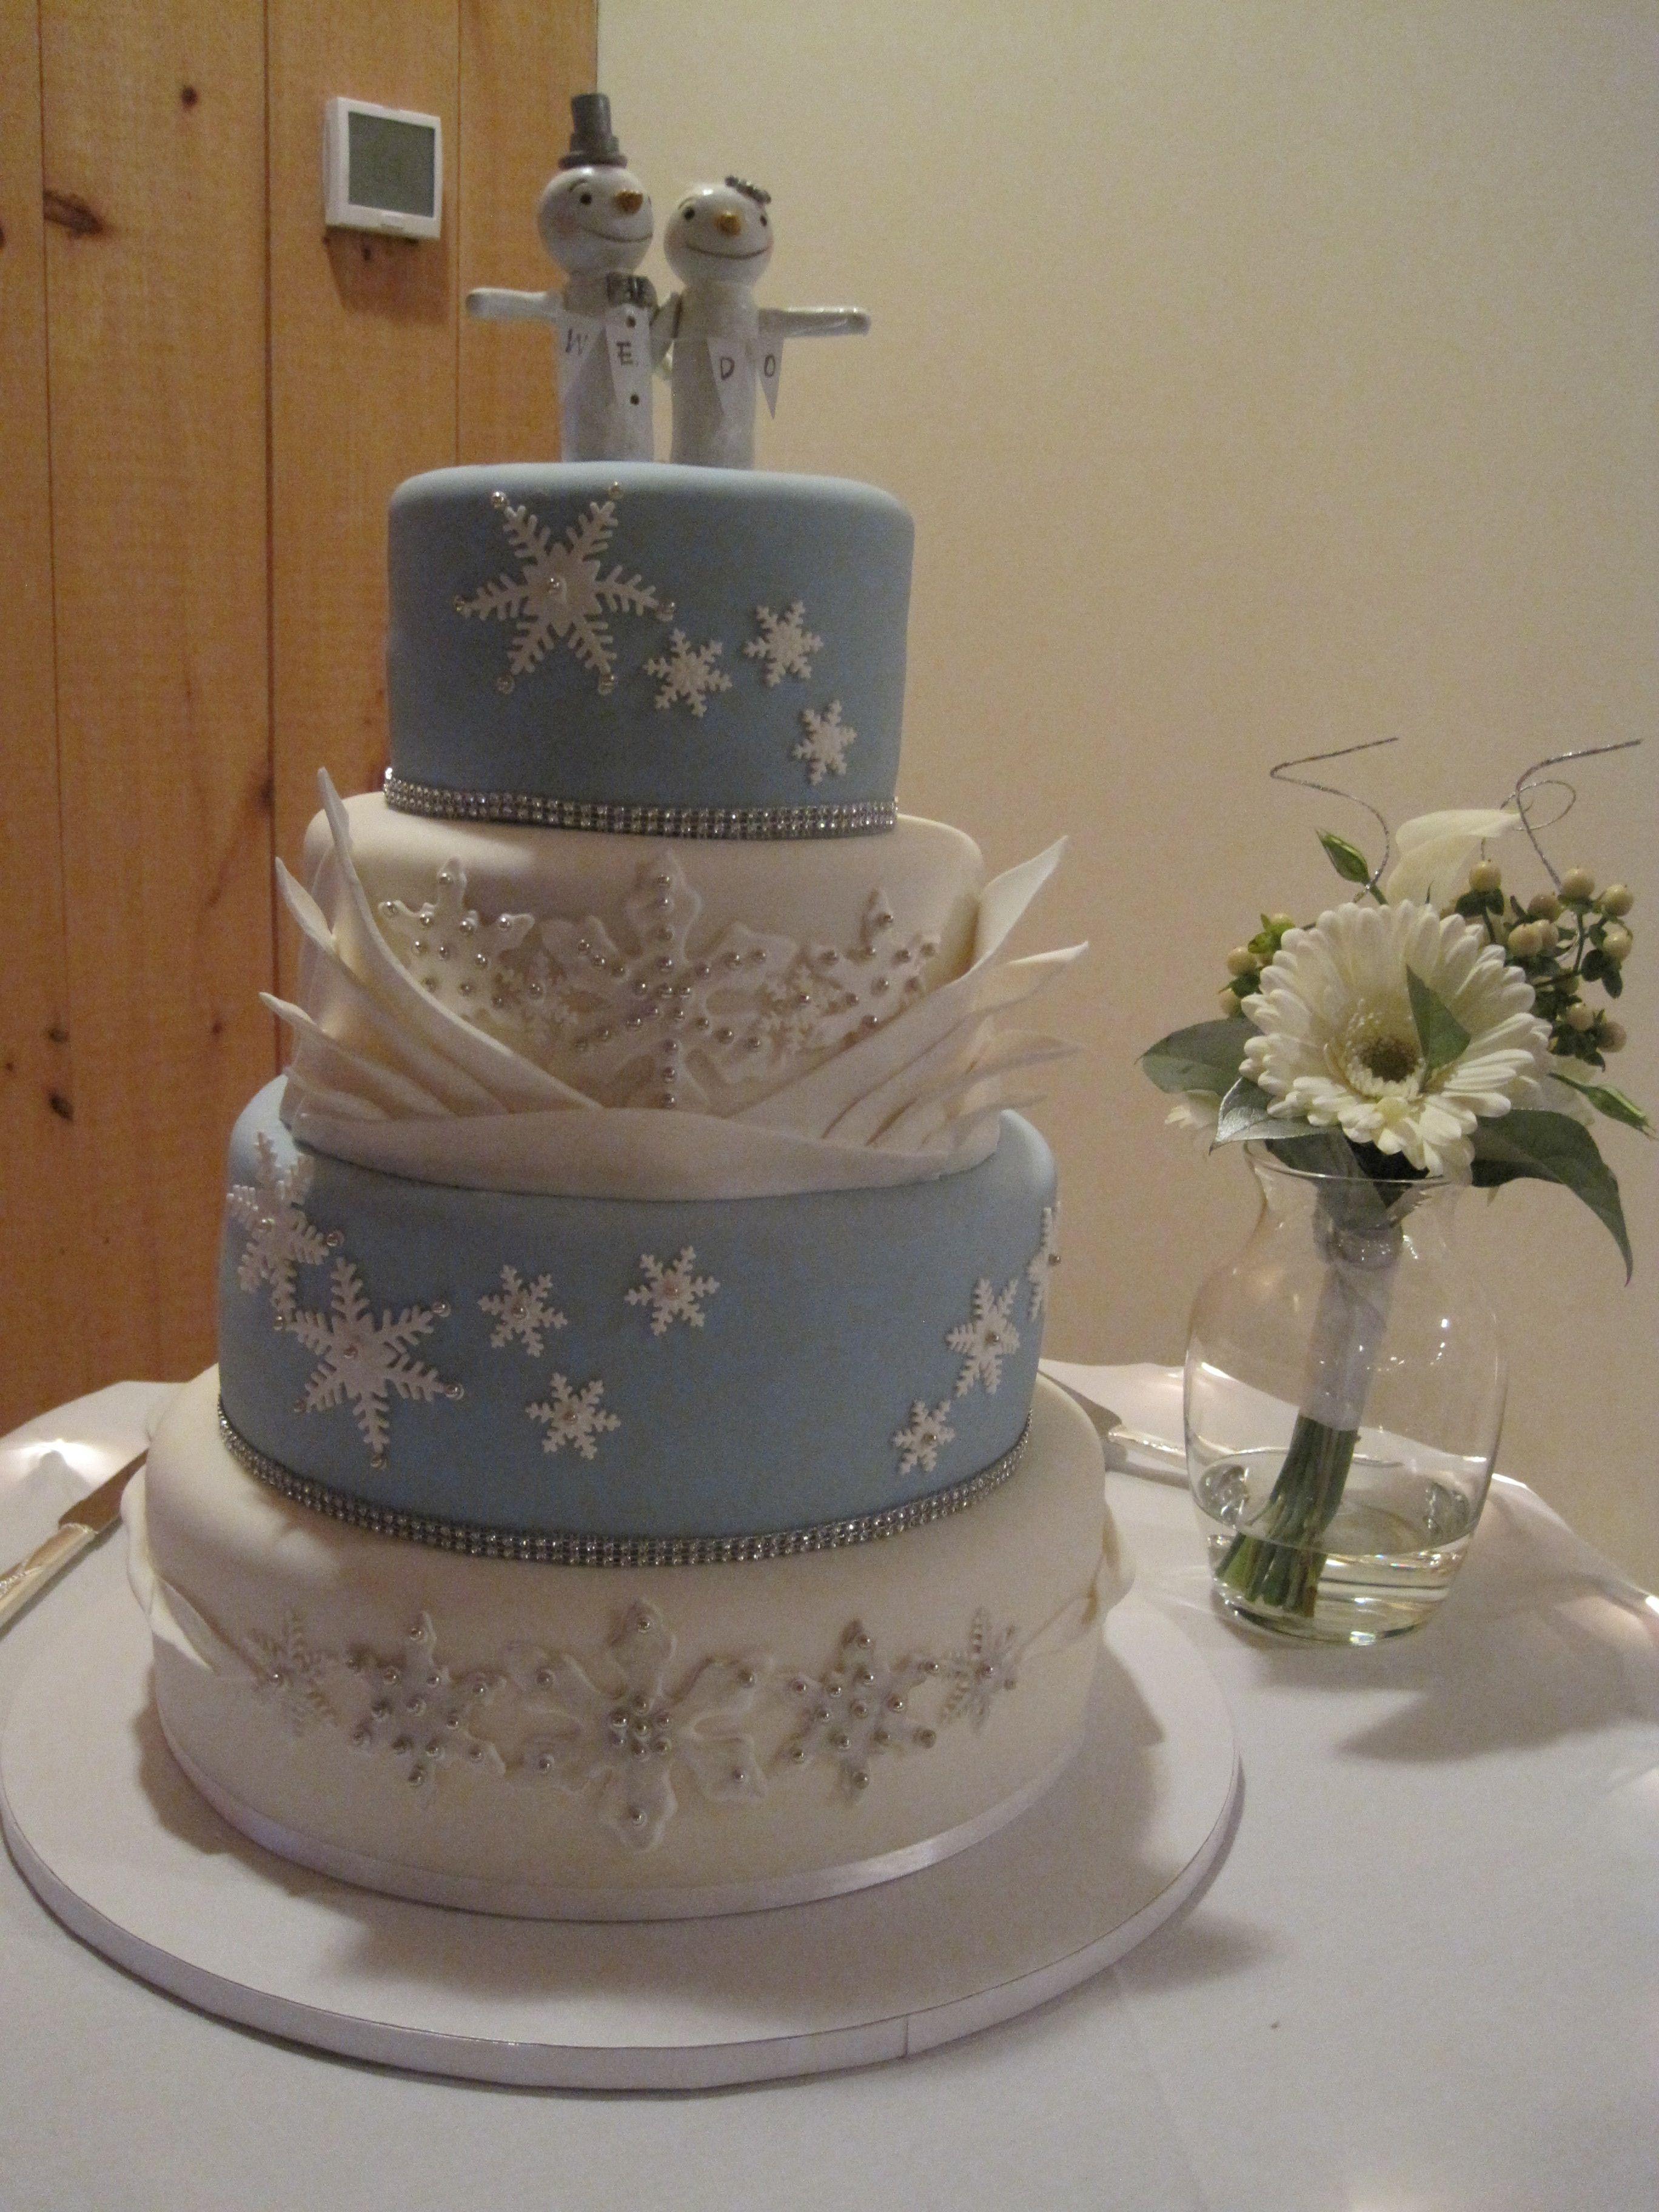 Winter wedding cake!